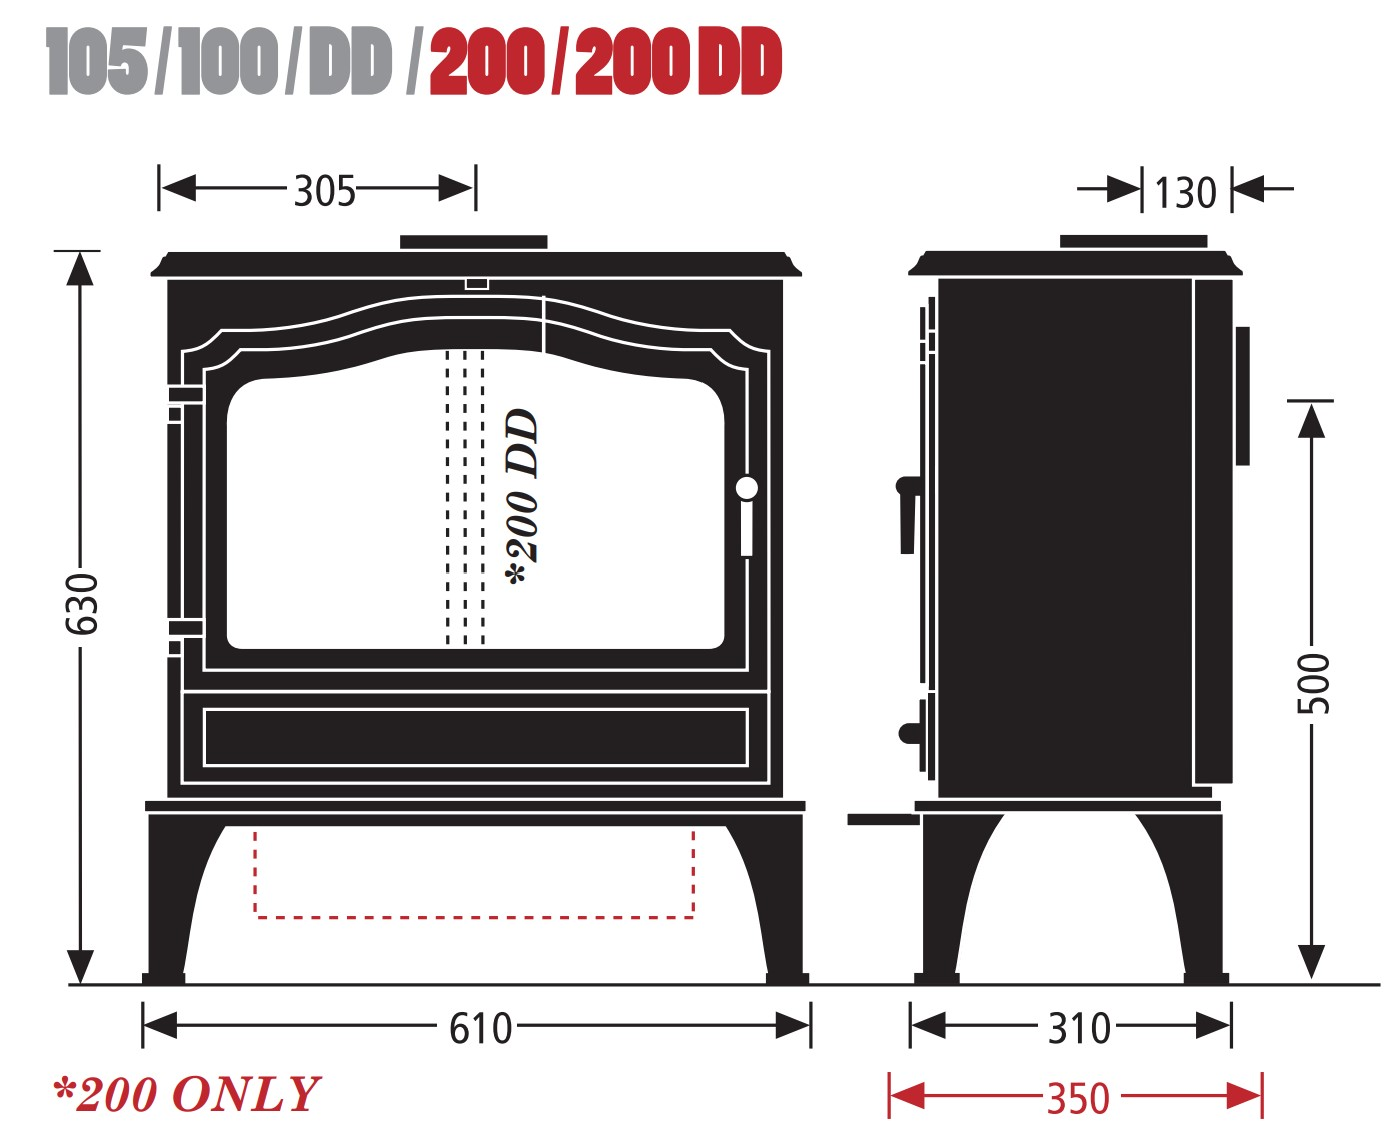 Esse woodburning stove - model 105/100/DD/200/200DD - dimensions / schematic